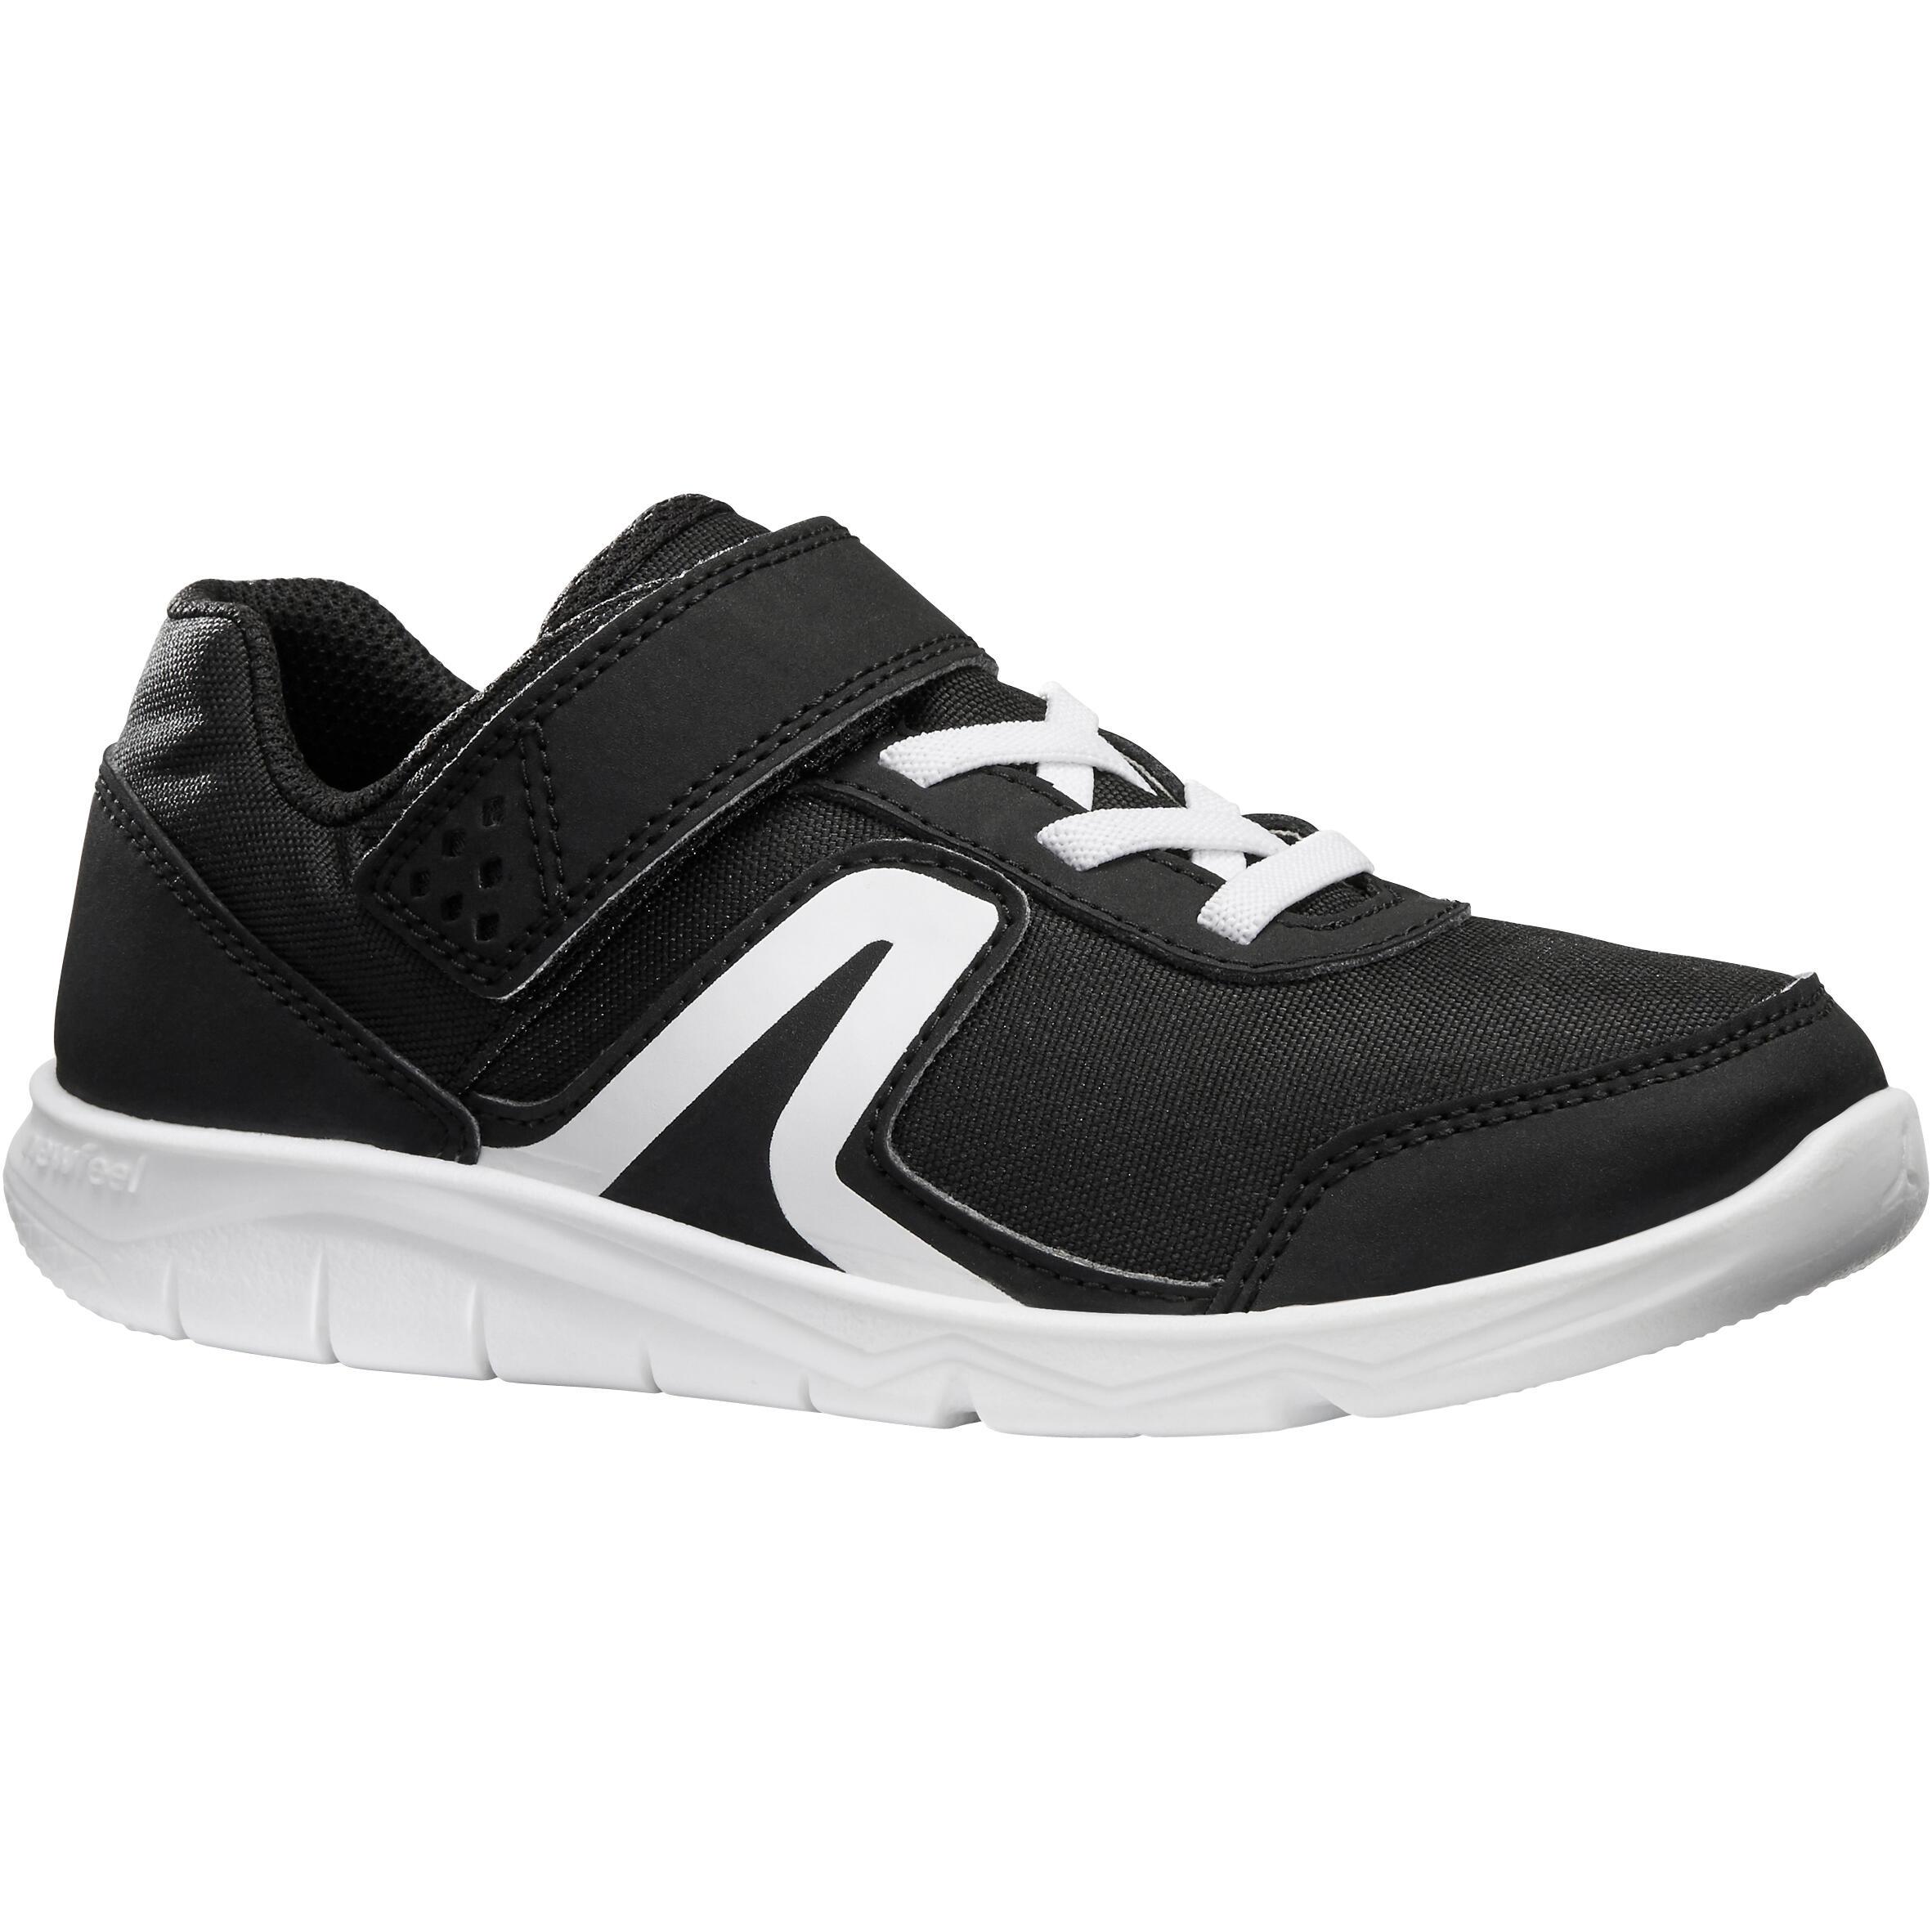 Black walking shoes for kids PW 100